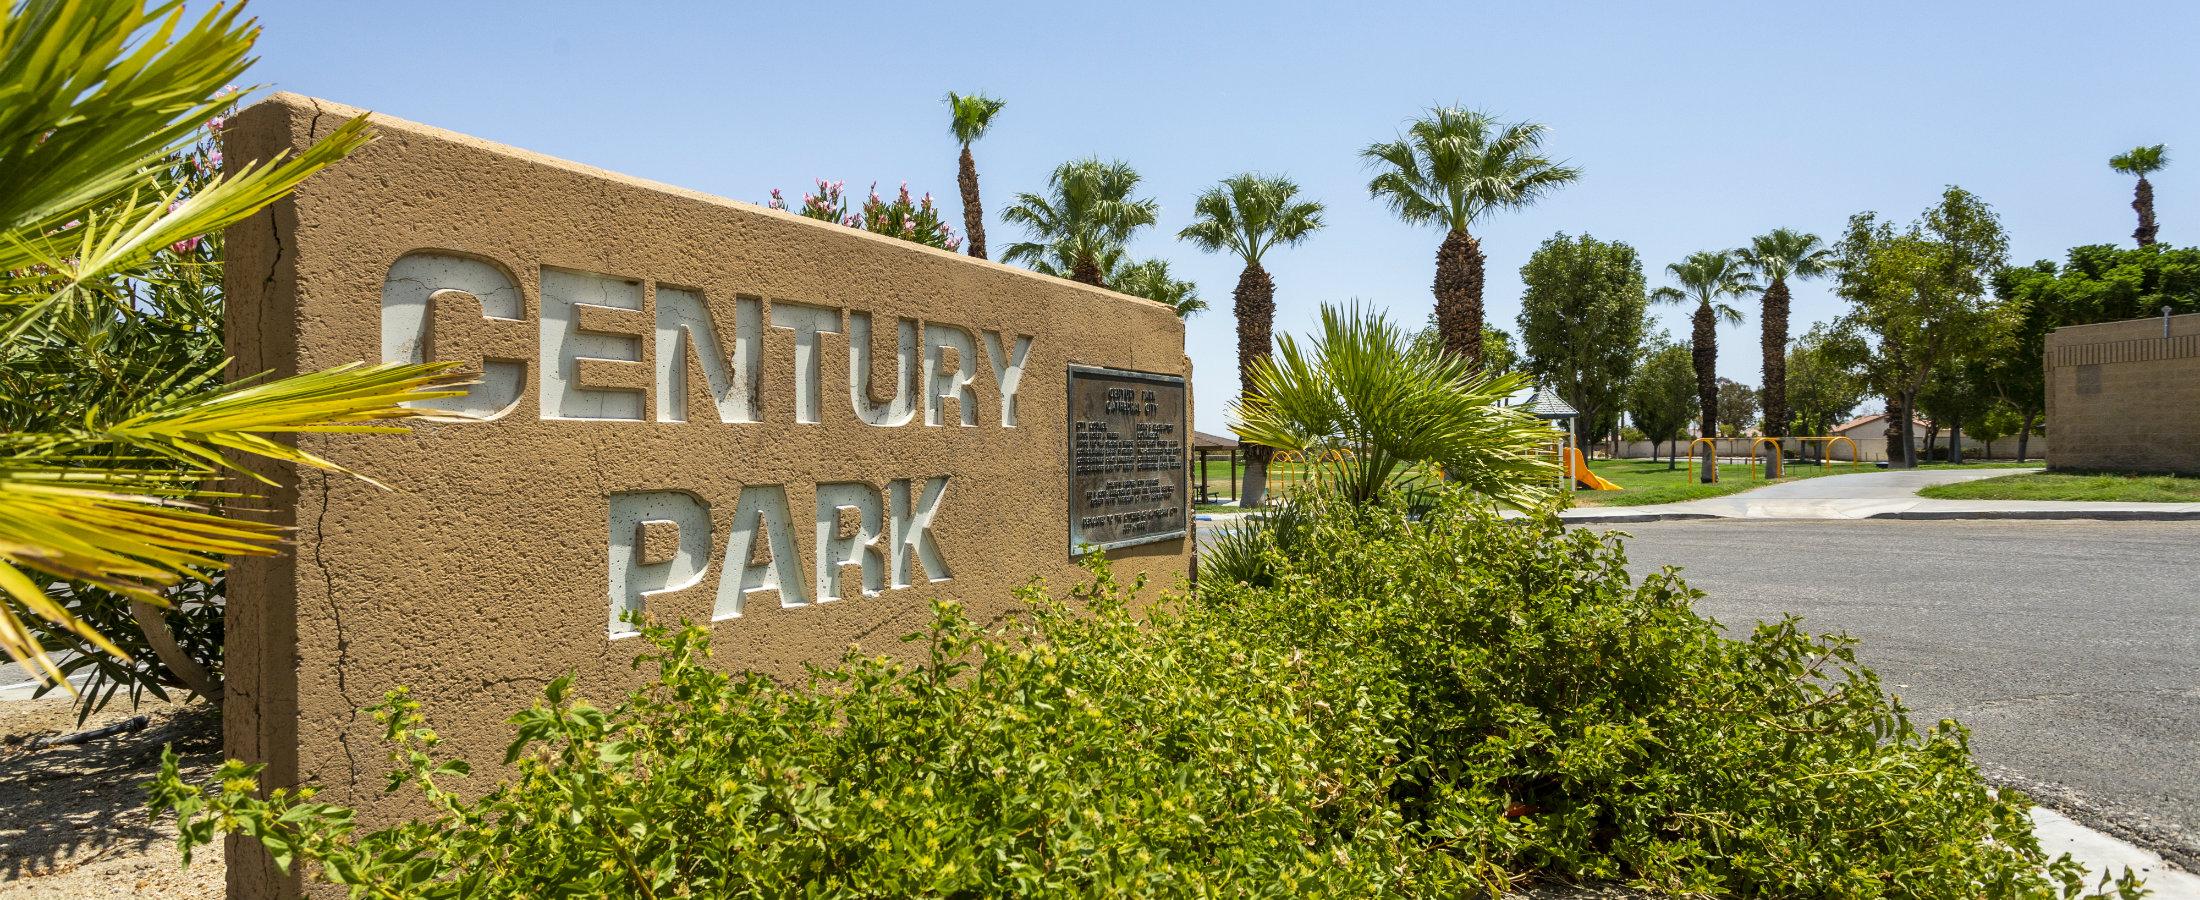 Century Park Real Estate Century Park Homes For Sale